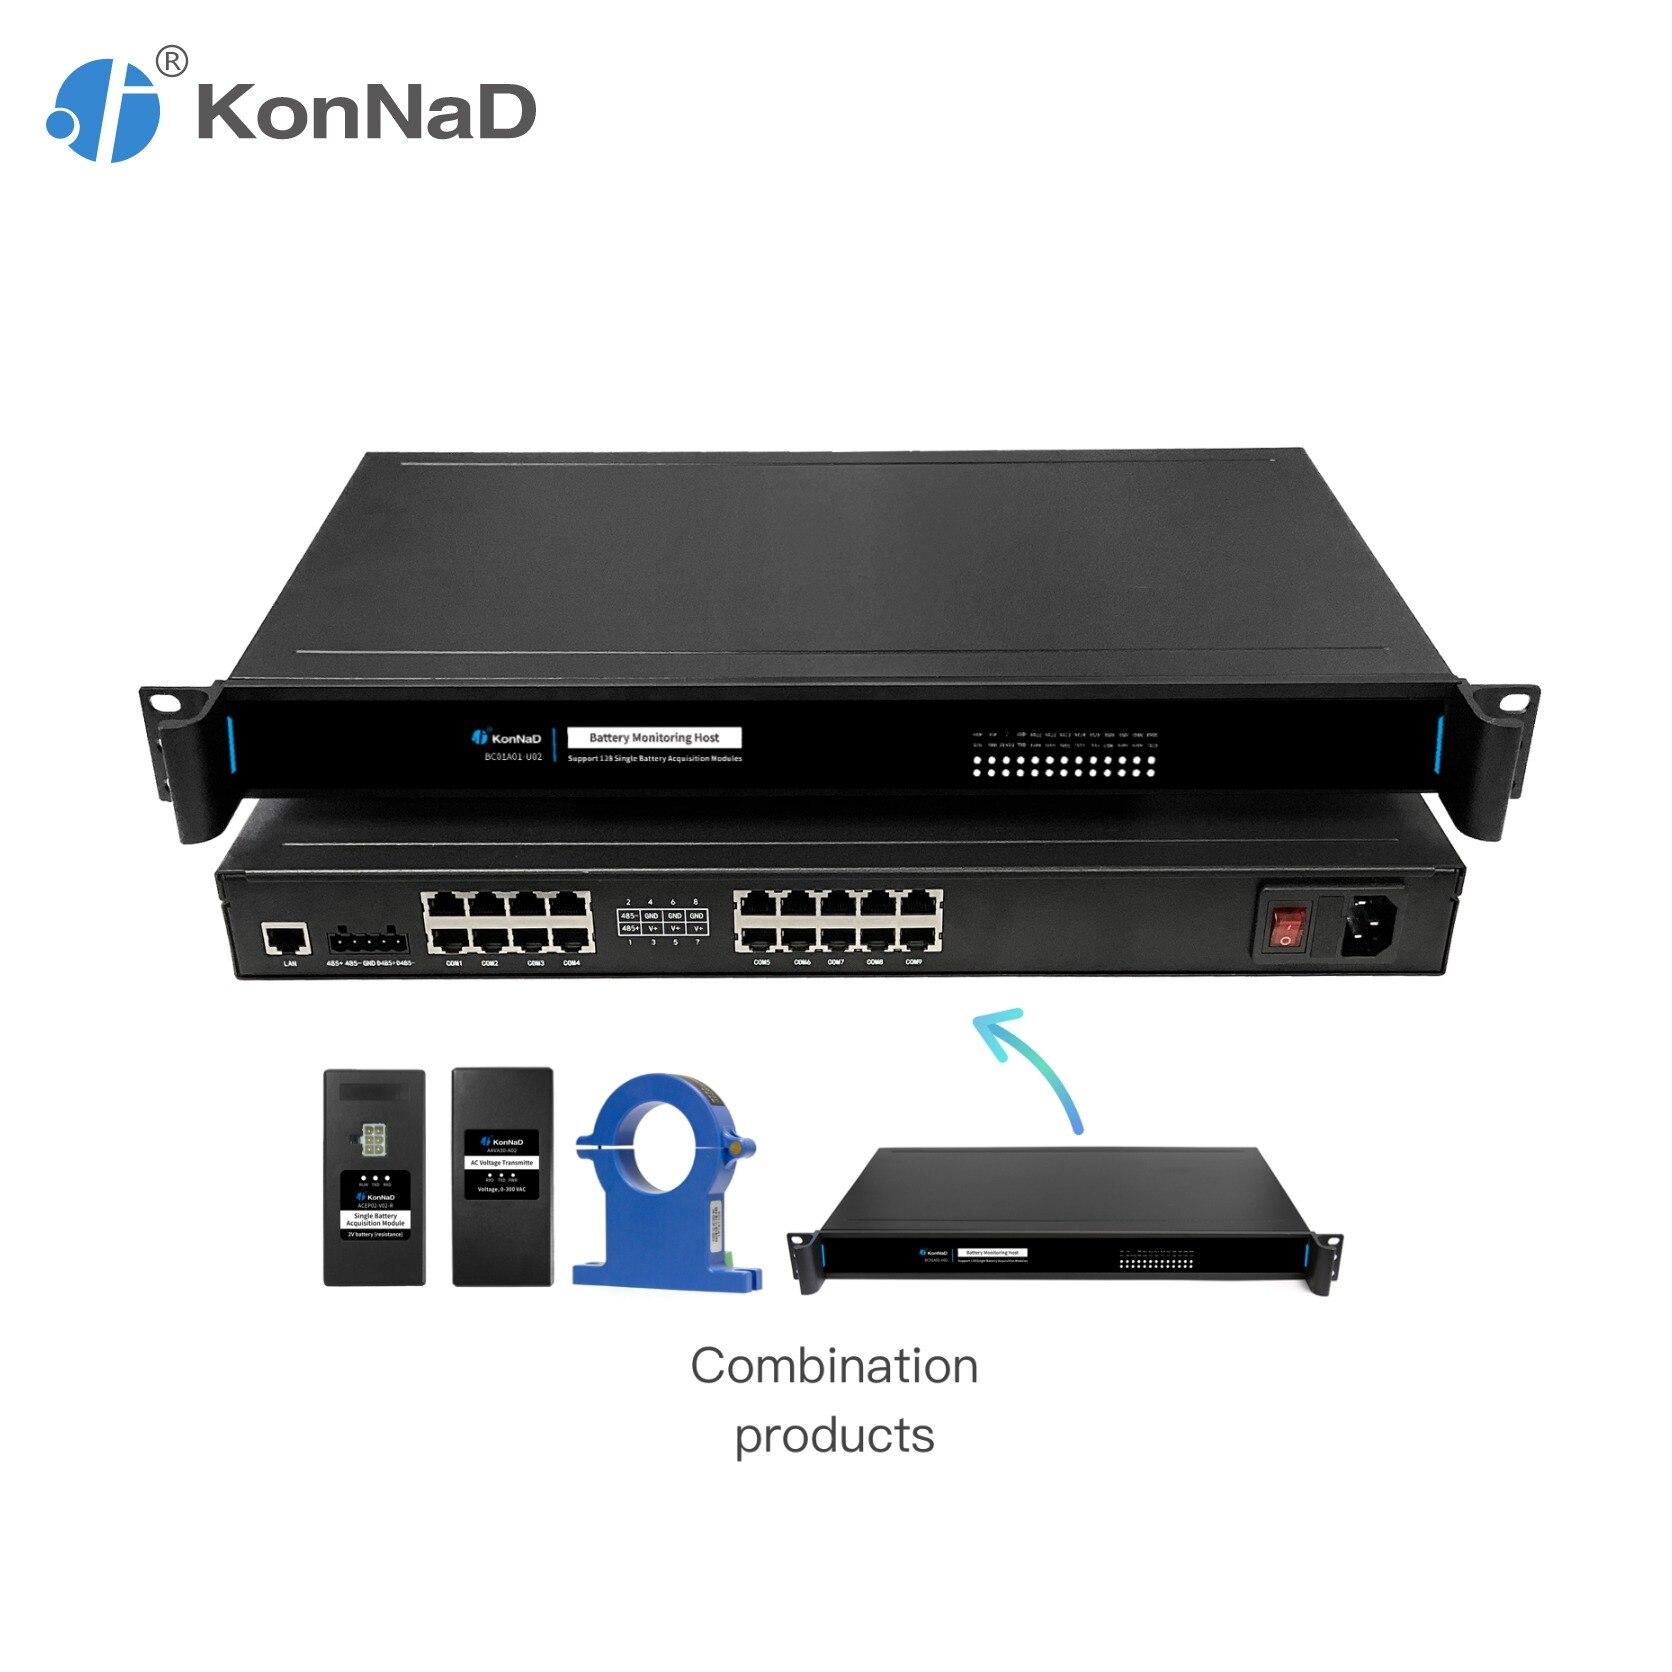 Battery Monitoring Host Support 128 Single Battery Module Dual Power Supply Modbus TCP/RTU KonNaD